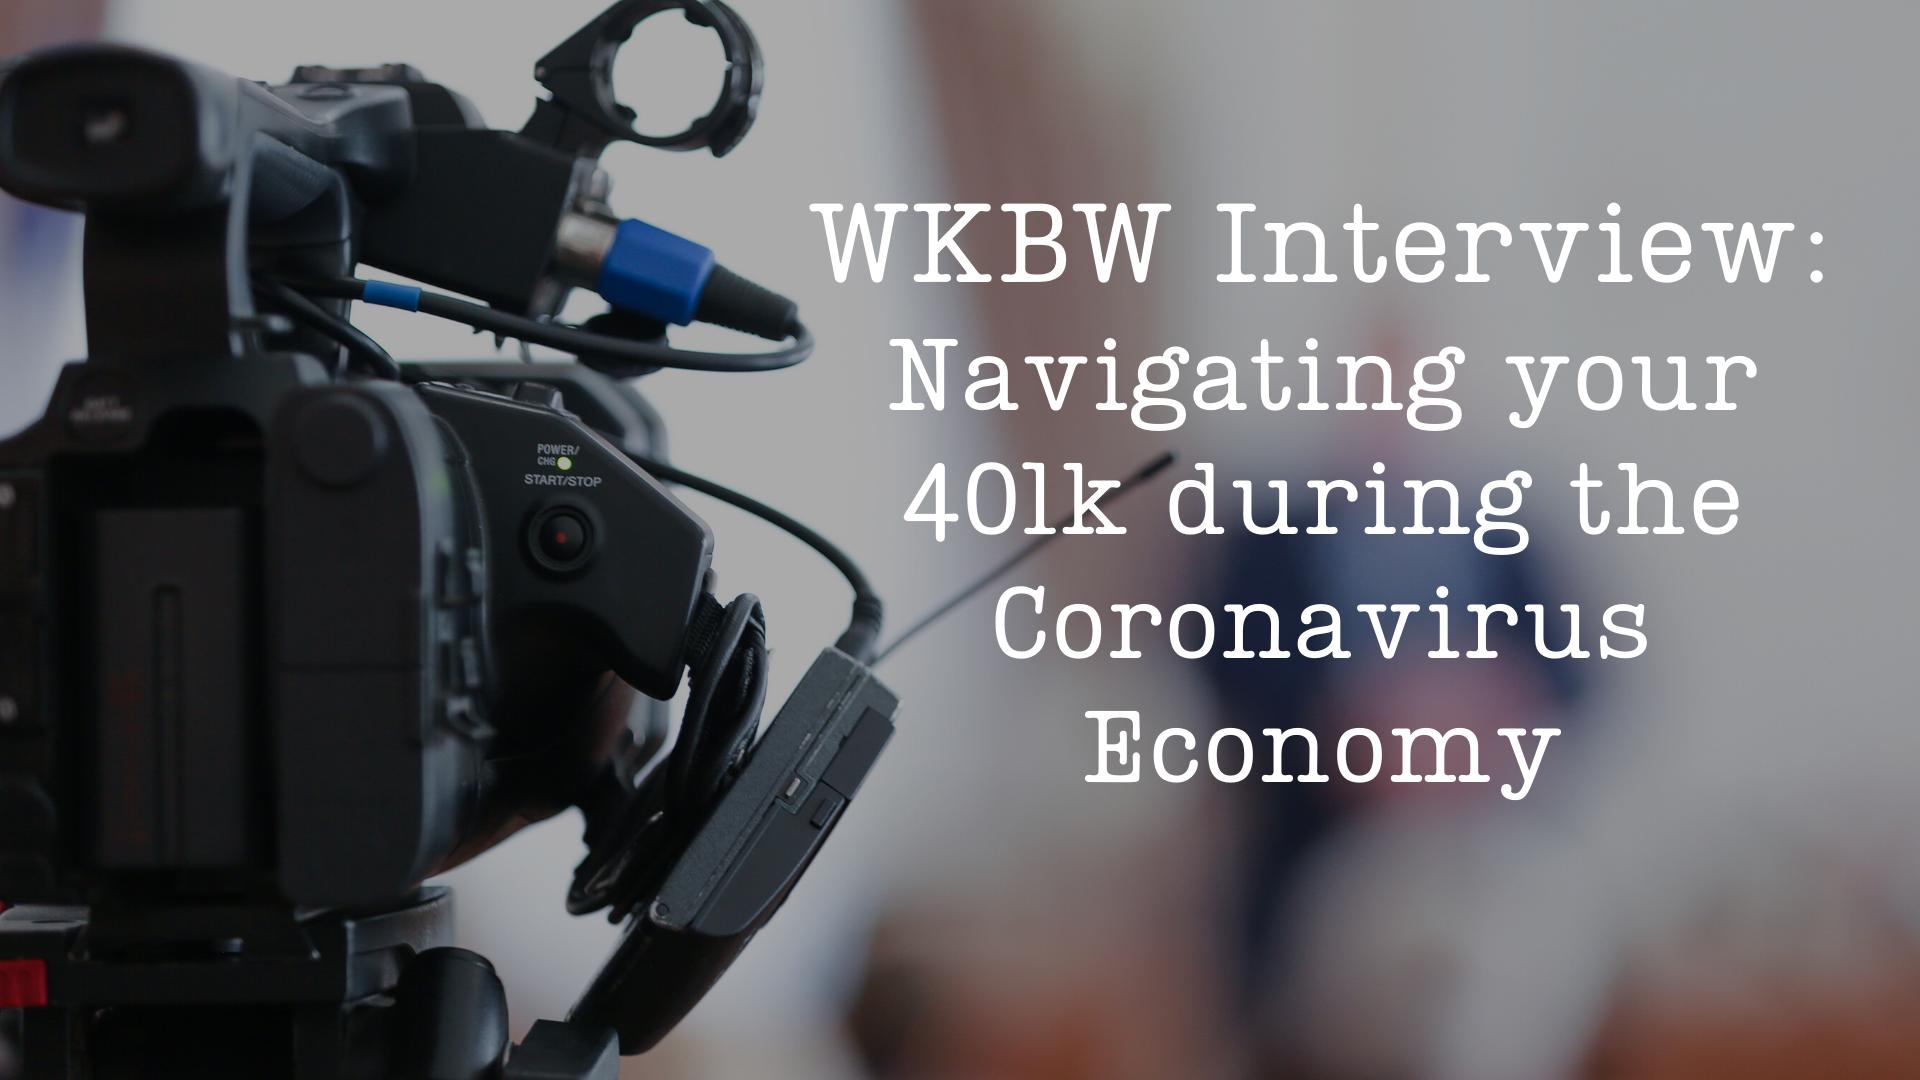 WKBW Interview: Navigating your 401k during the Coronavirus Economy